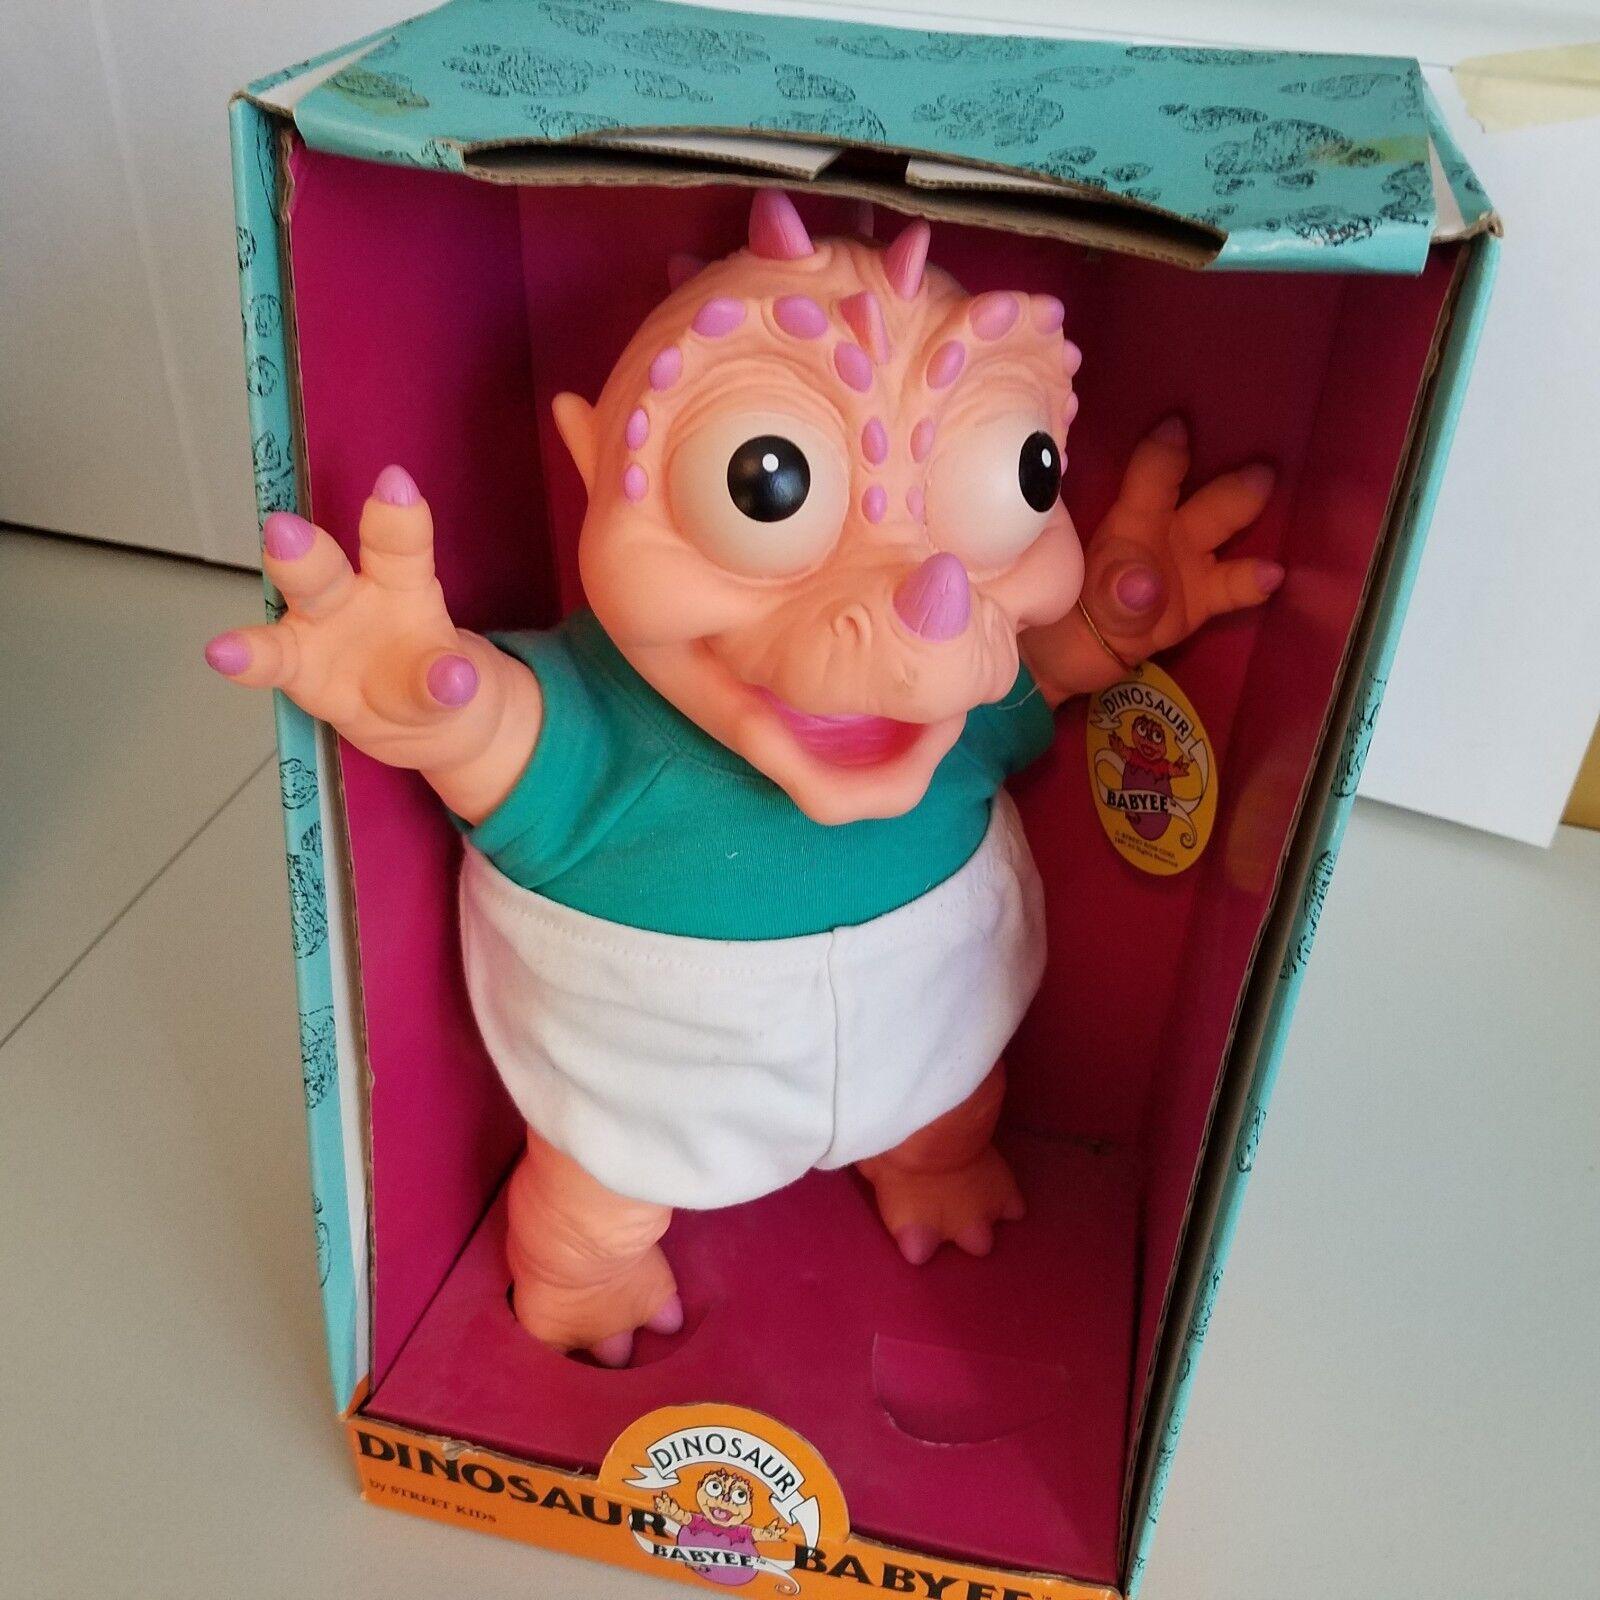 Dinosaur Babyee Doll street kids 12  1991 New in box diaper Grün NIB cute tags